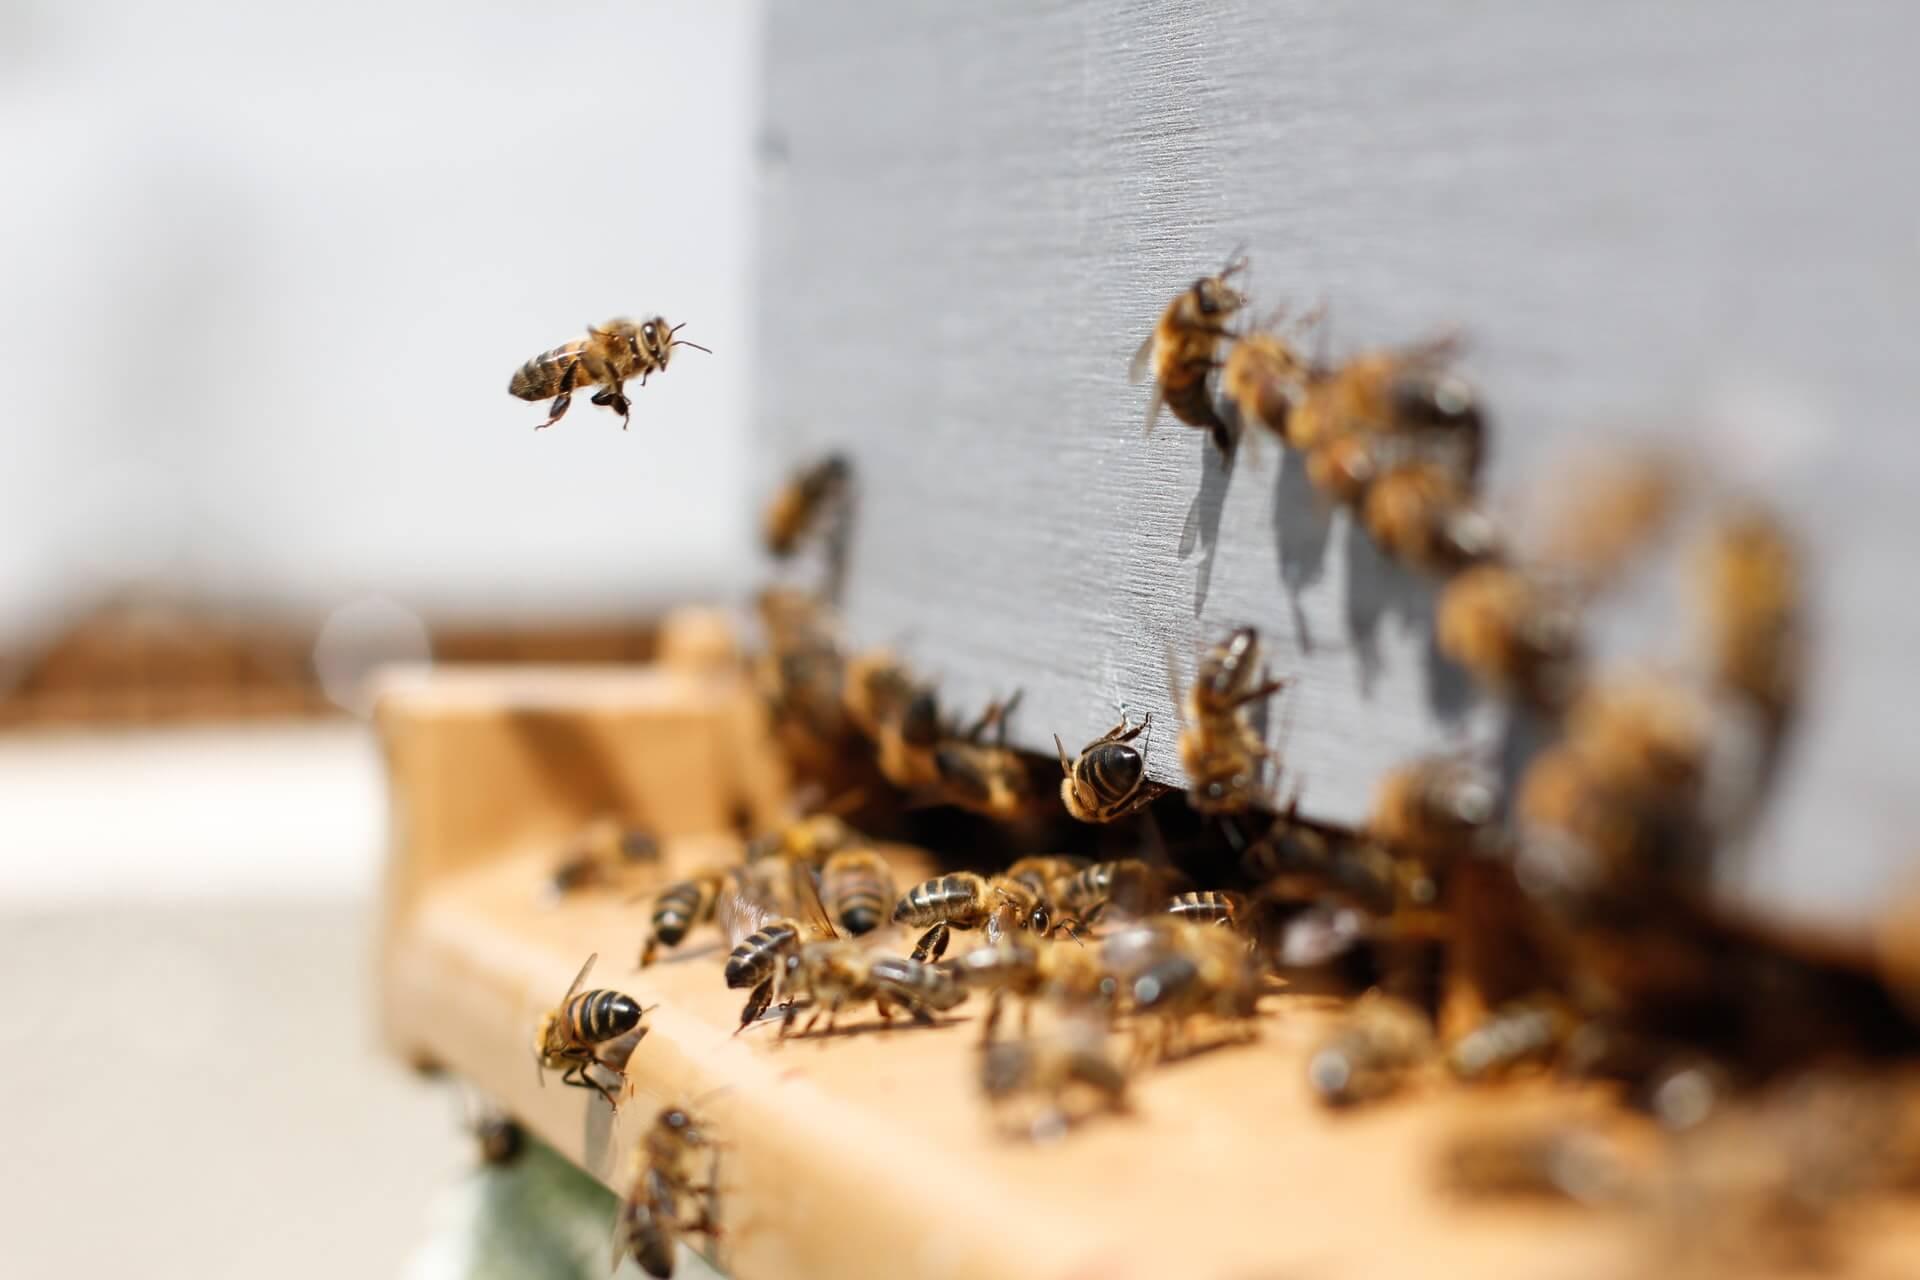 Dozens of bees working